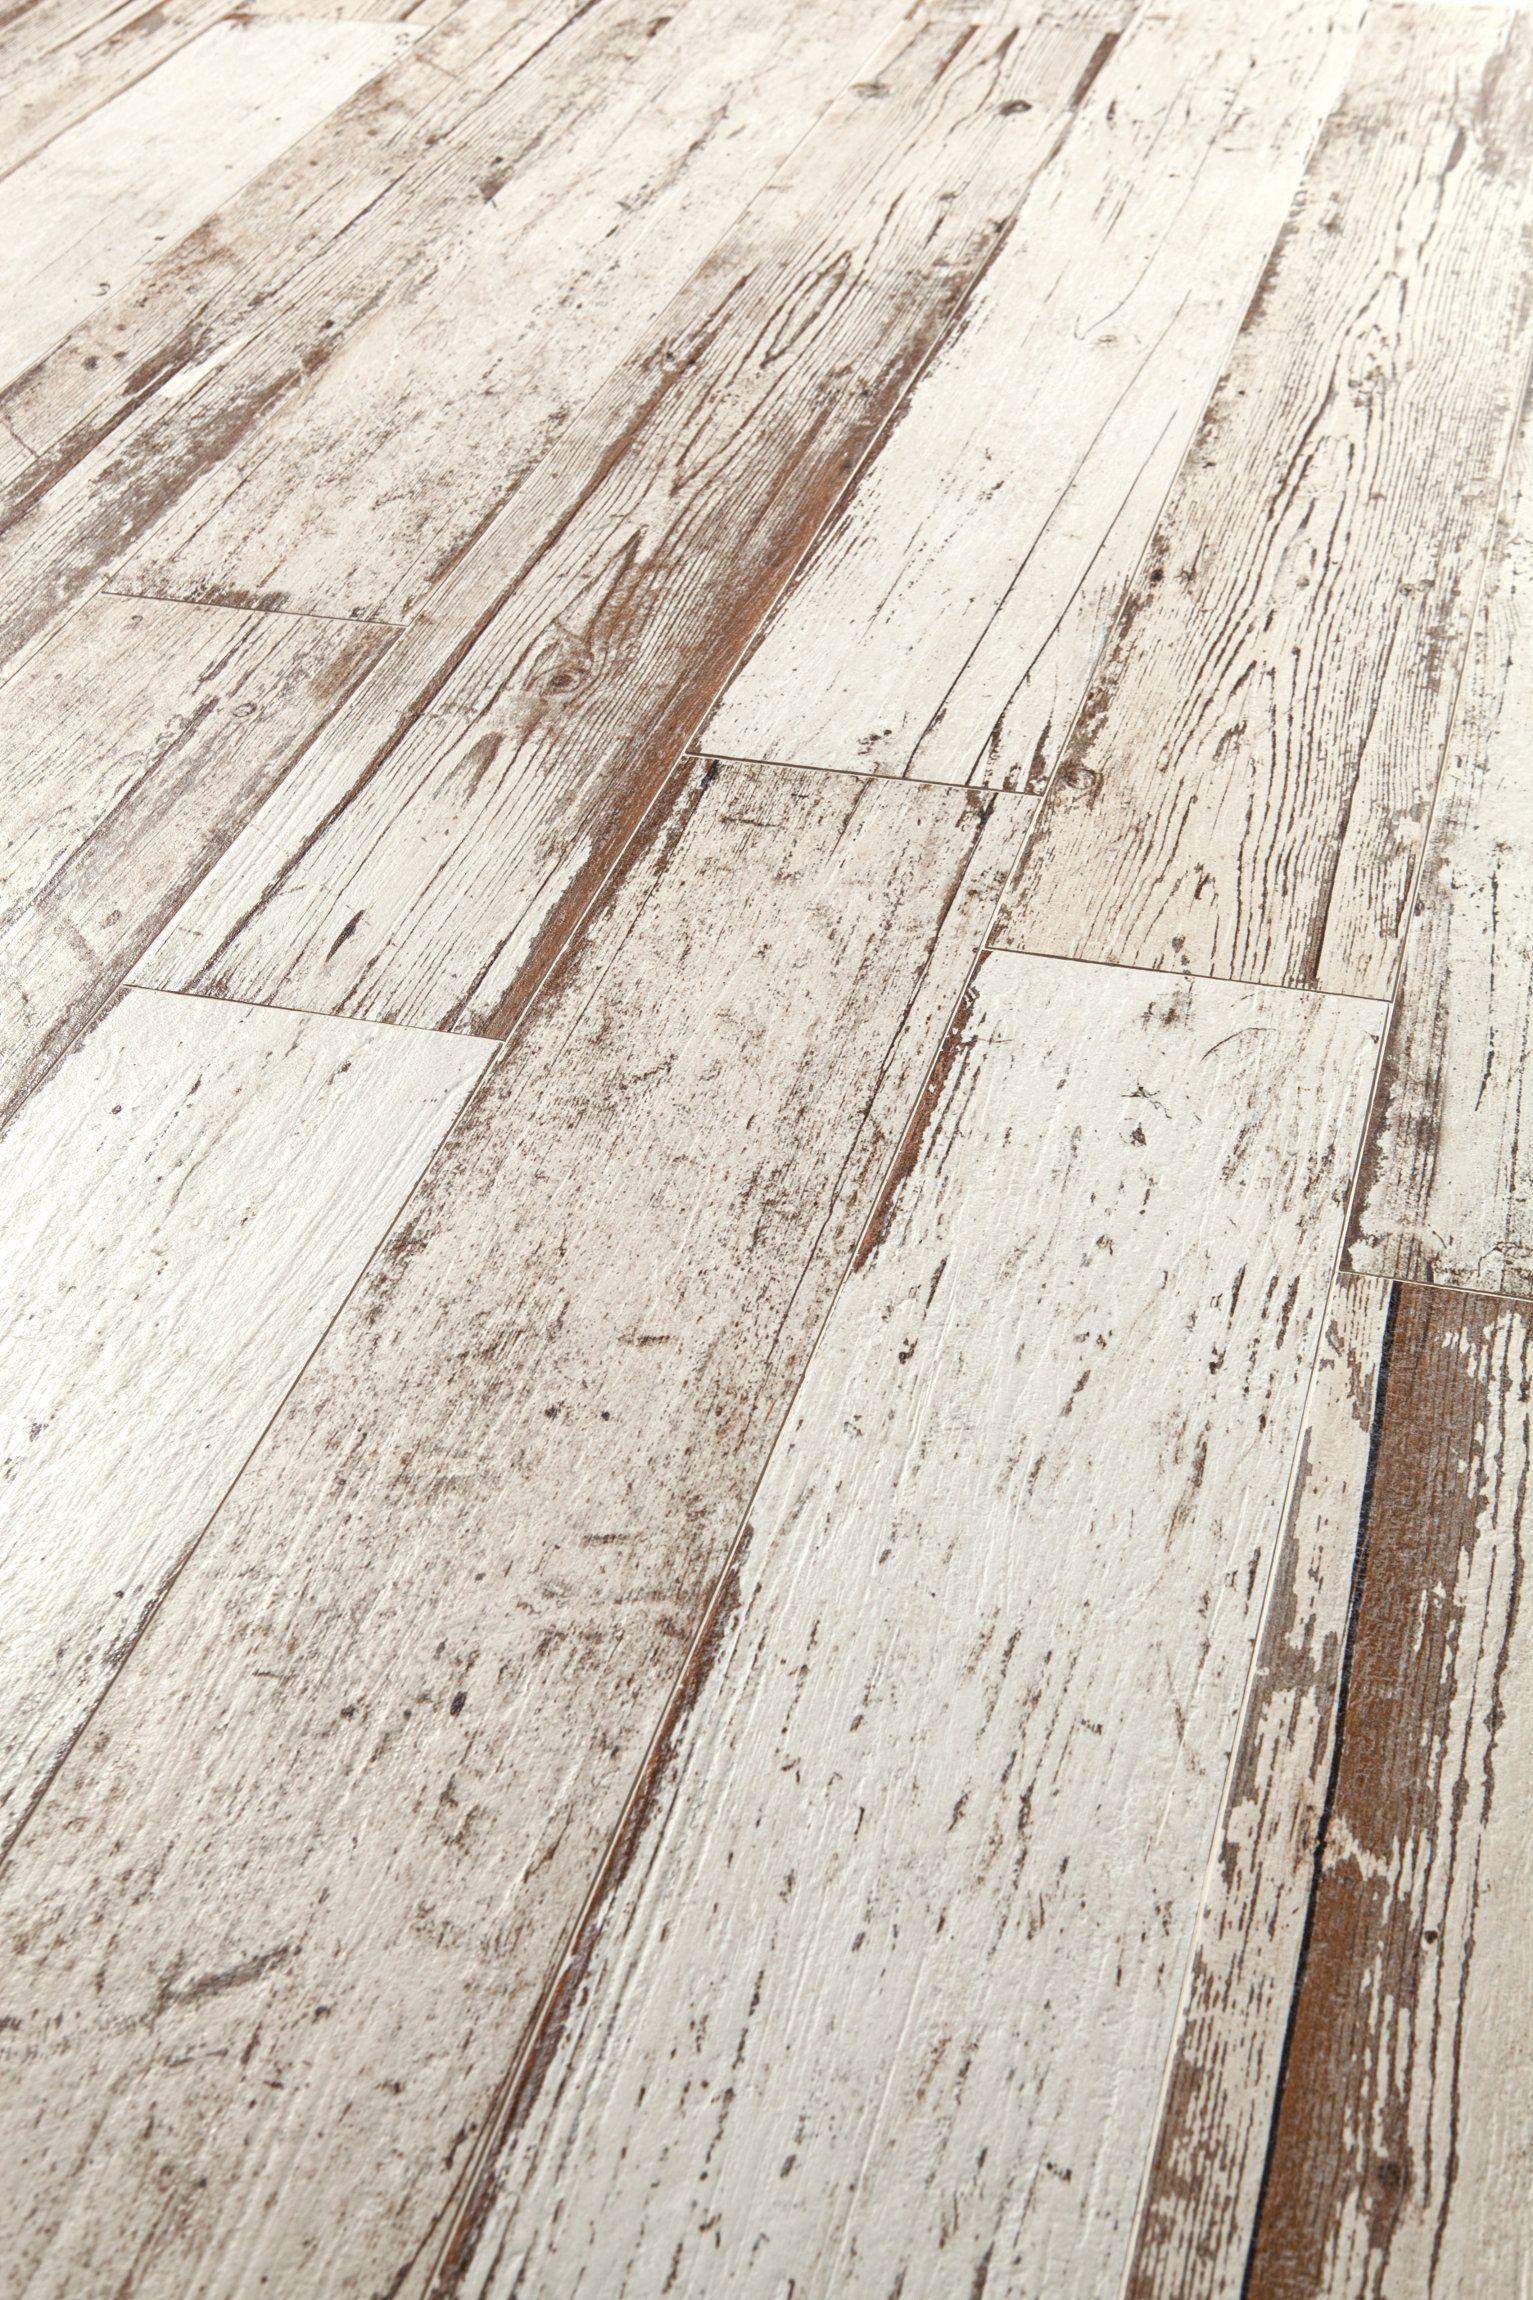 Fliese Holzoptik Vintage Weiss Beige 15x120cm Blendart Natural In 2020 Holzfliesen Badezimmer Fliesen Holzoptik Rustikale Boden